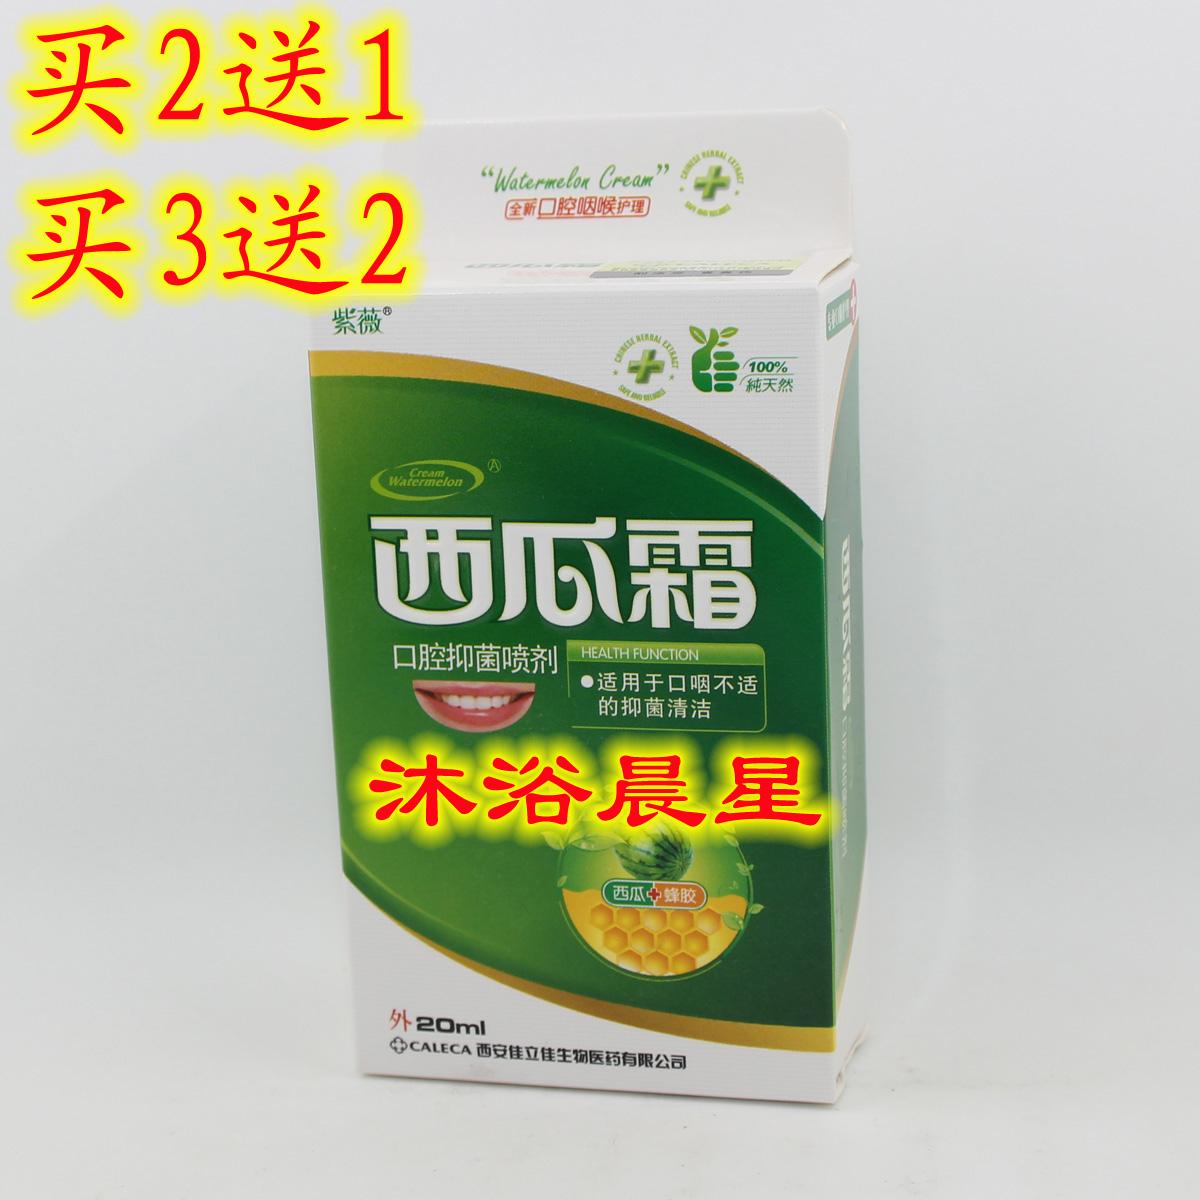 Authentic watermelon cream antibacterial spray watermelon